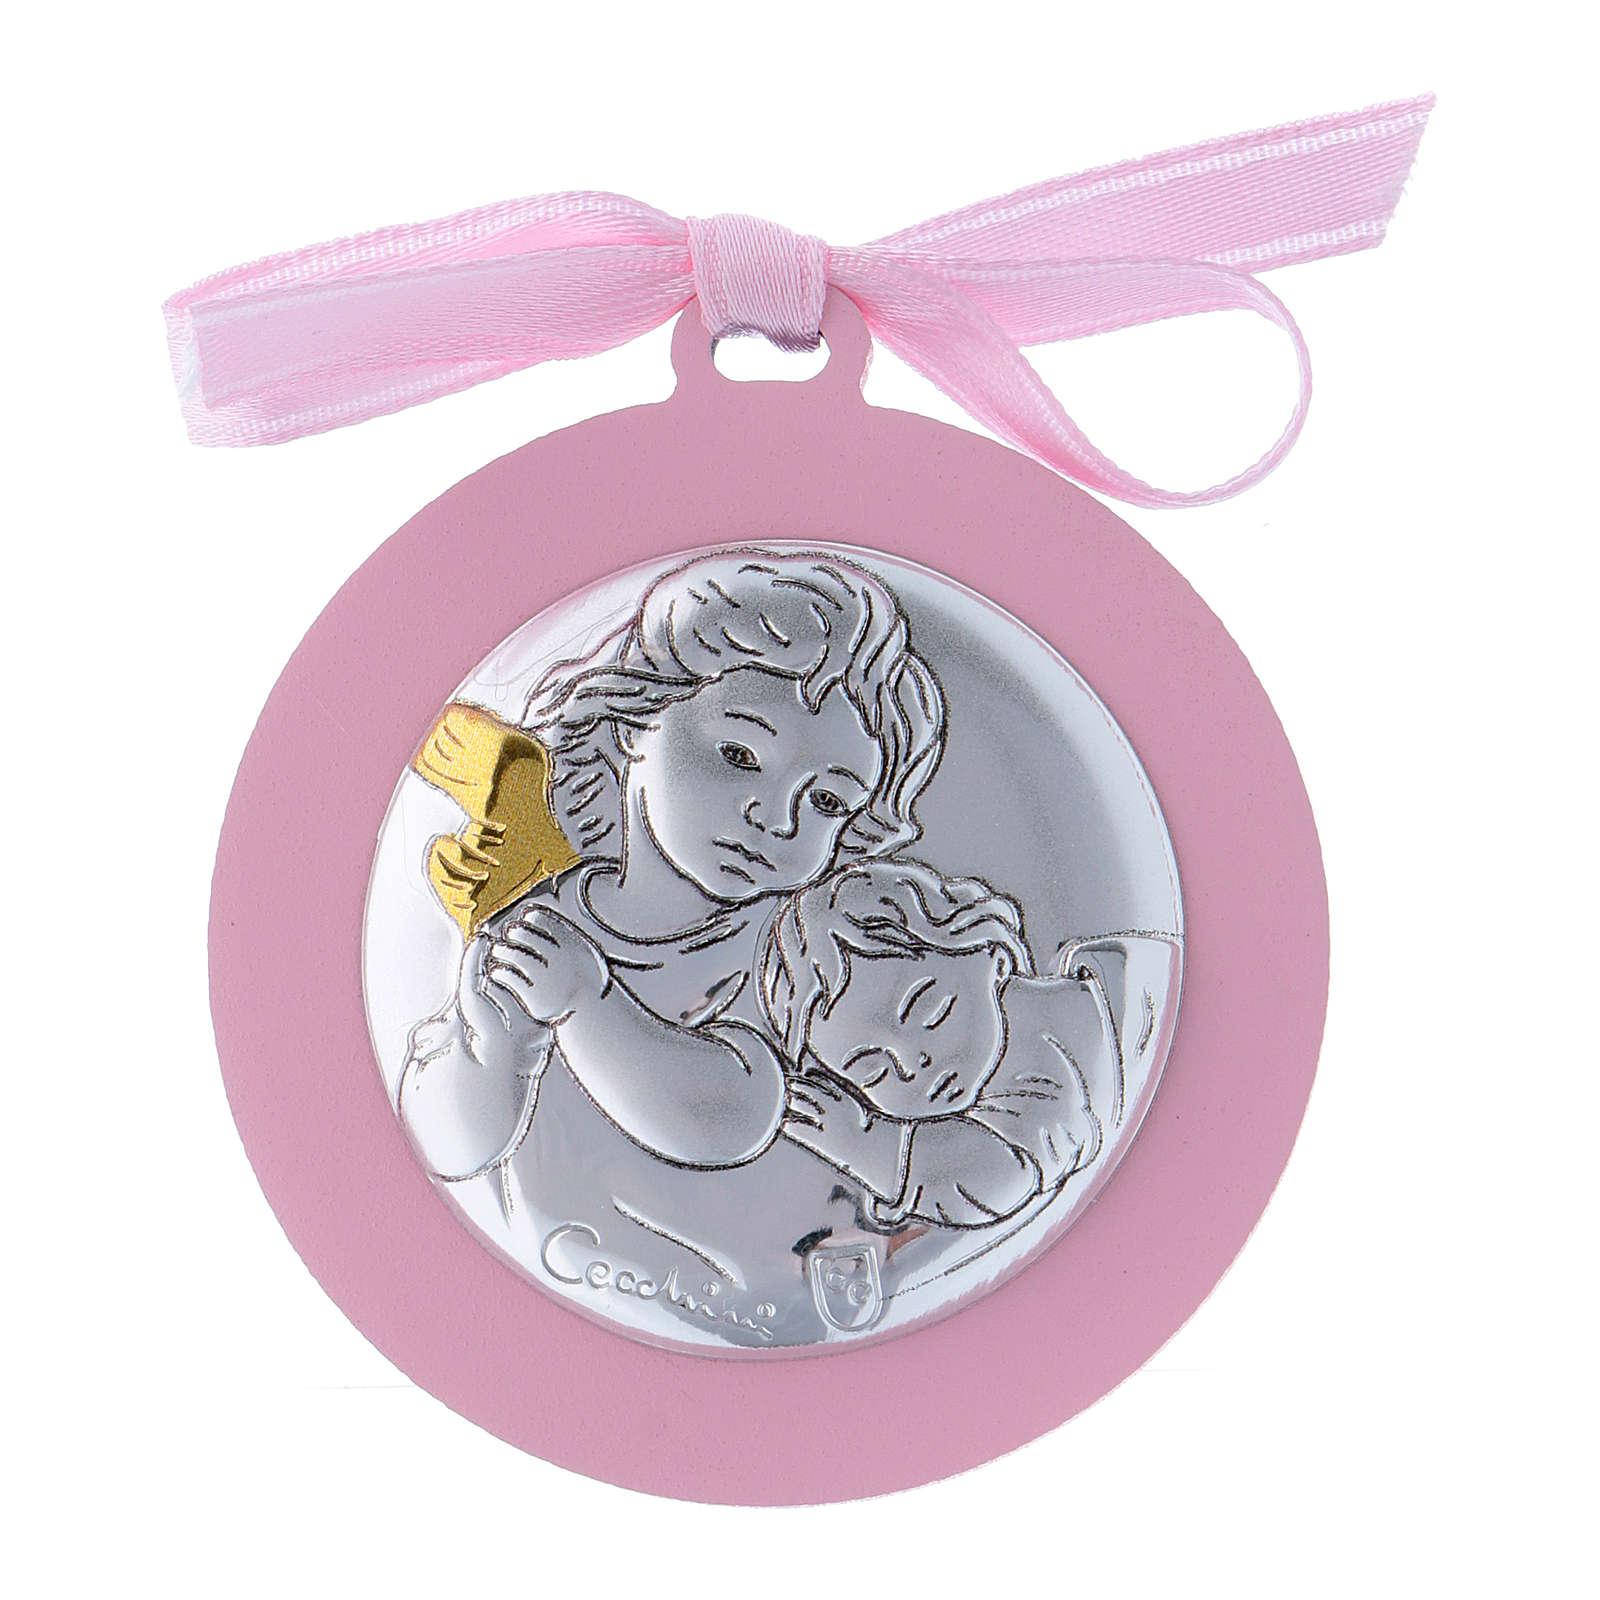 Sopraculla nastro rosa Angeli bilaminato finiture oro 4 cm 4